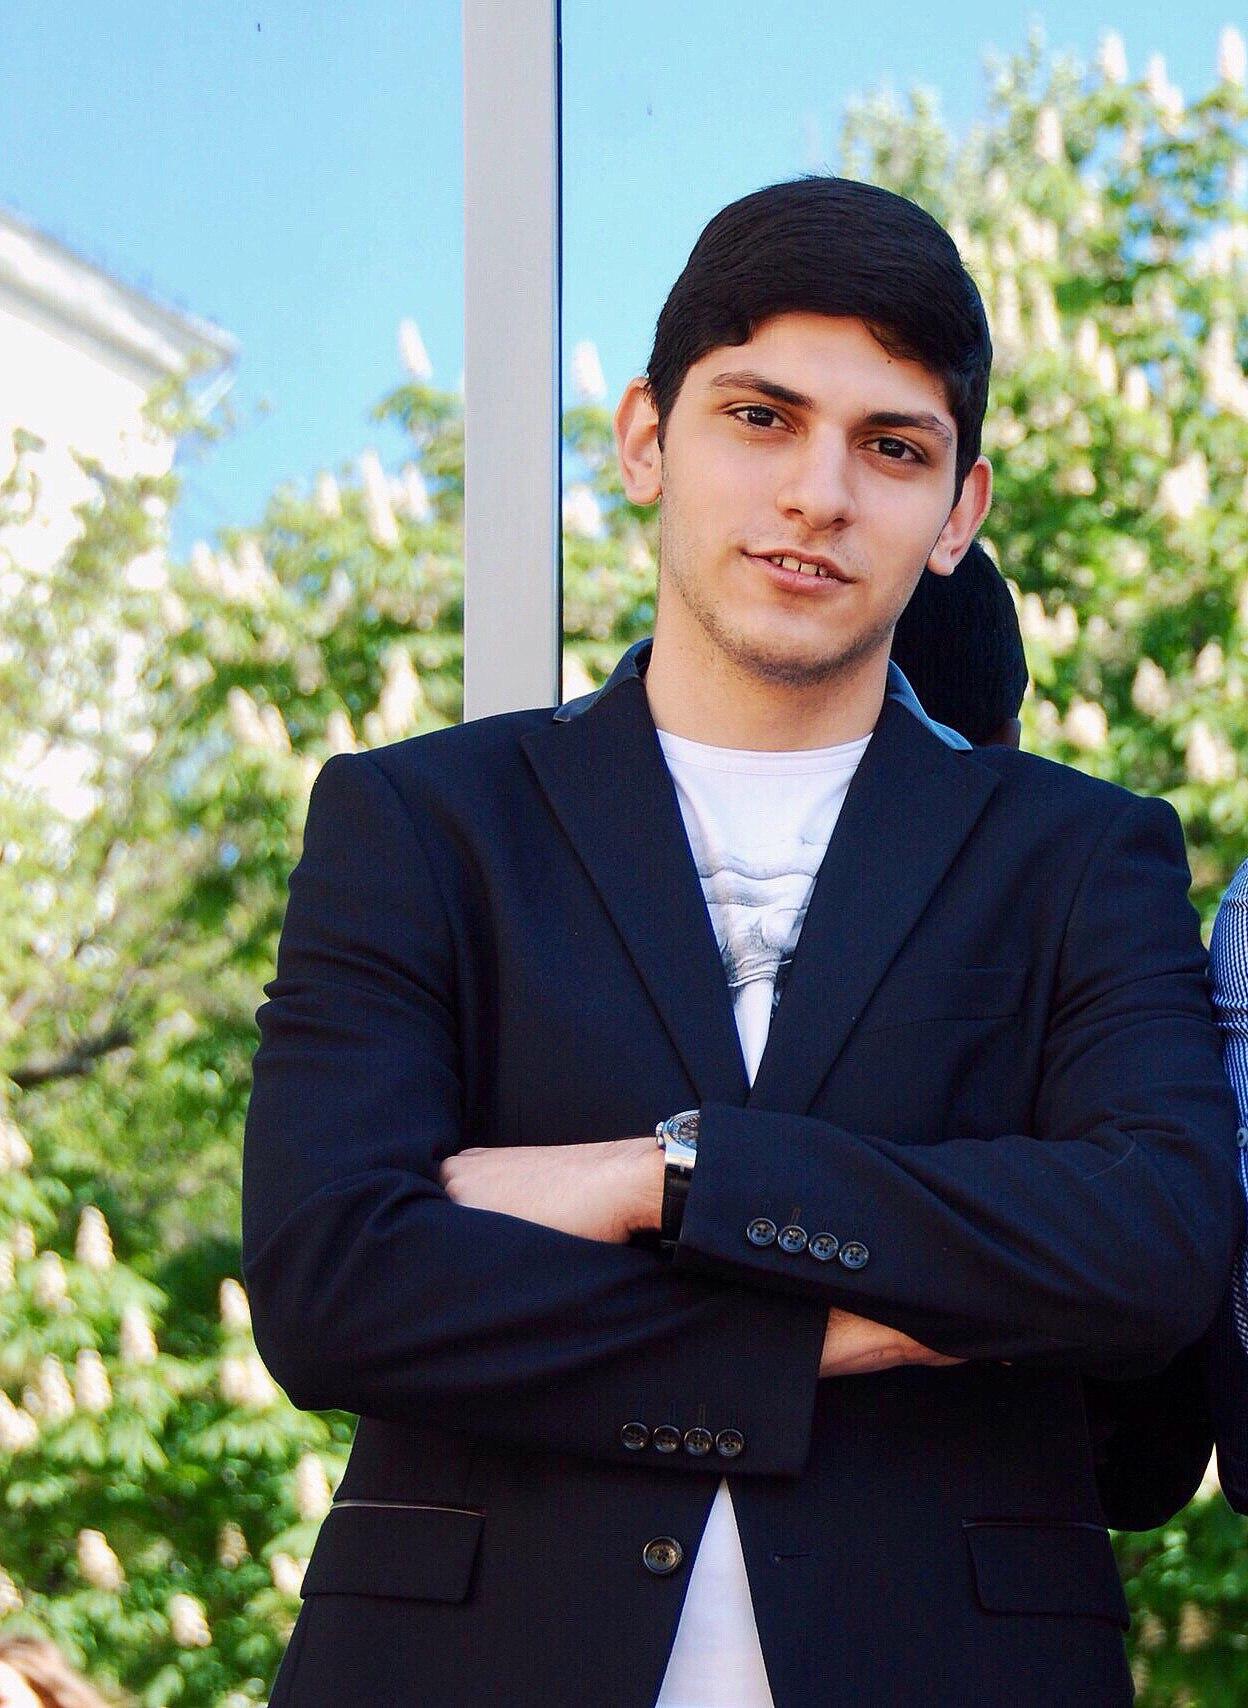 Давид Геворгян – студент 2 курса журфака НИУ ВШЭ